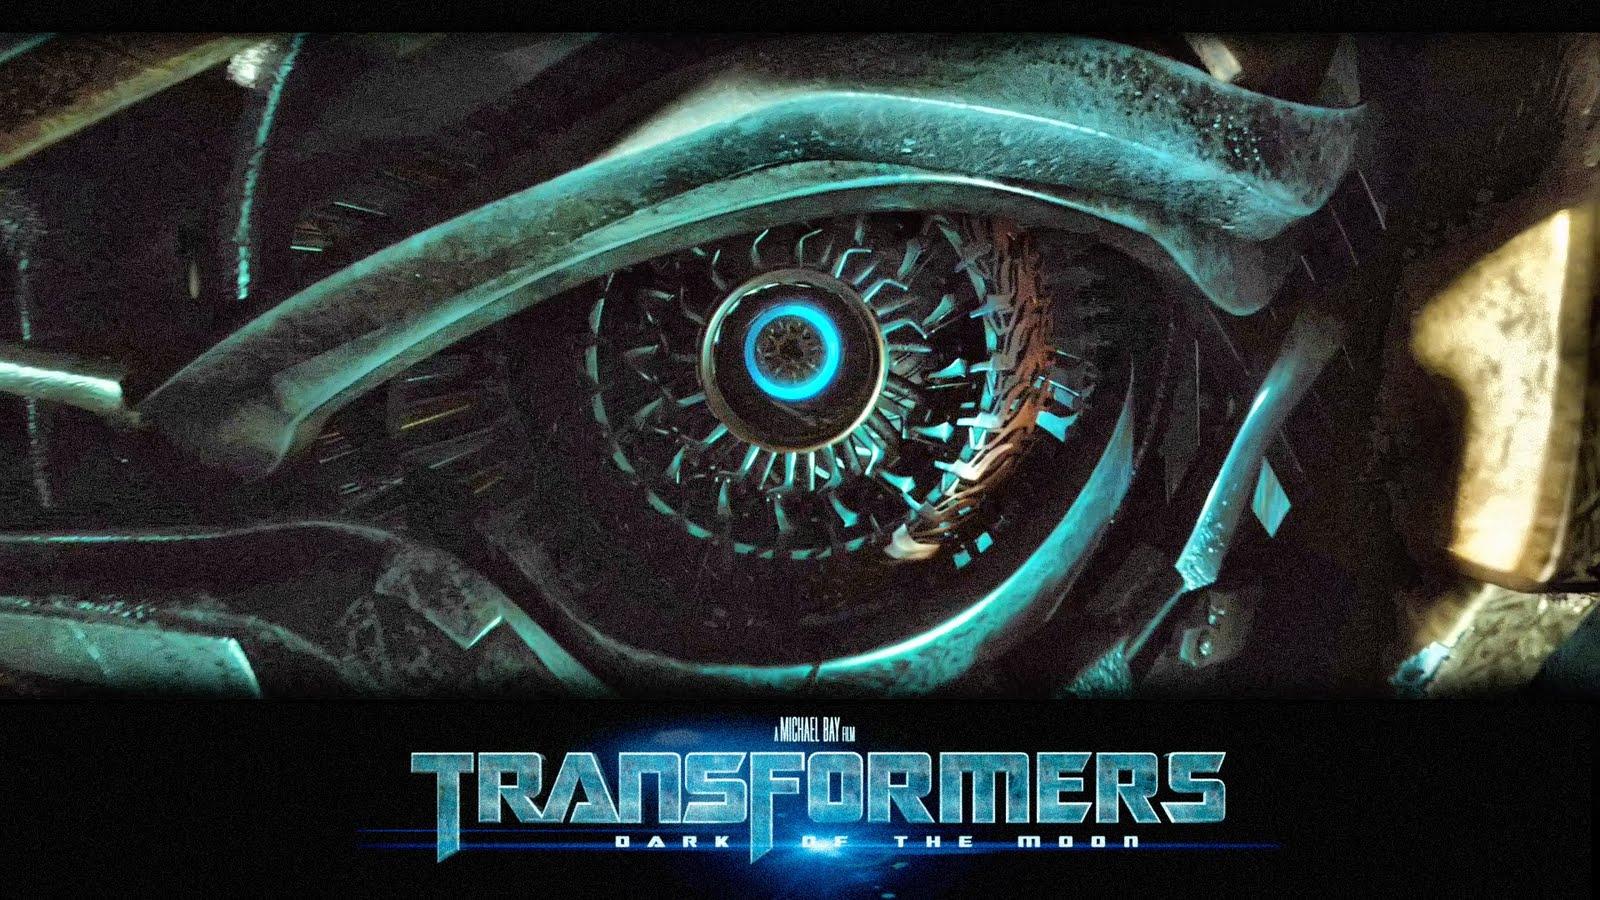 Gambar Wallpaper 3d Transformers Gambar Dp Bbm